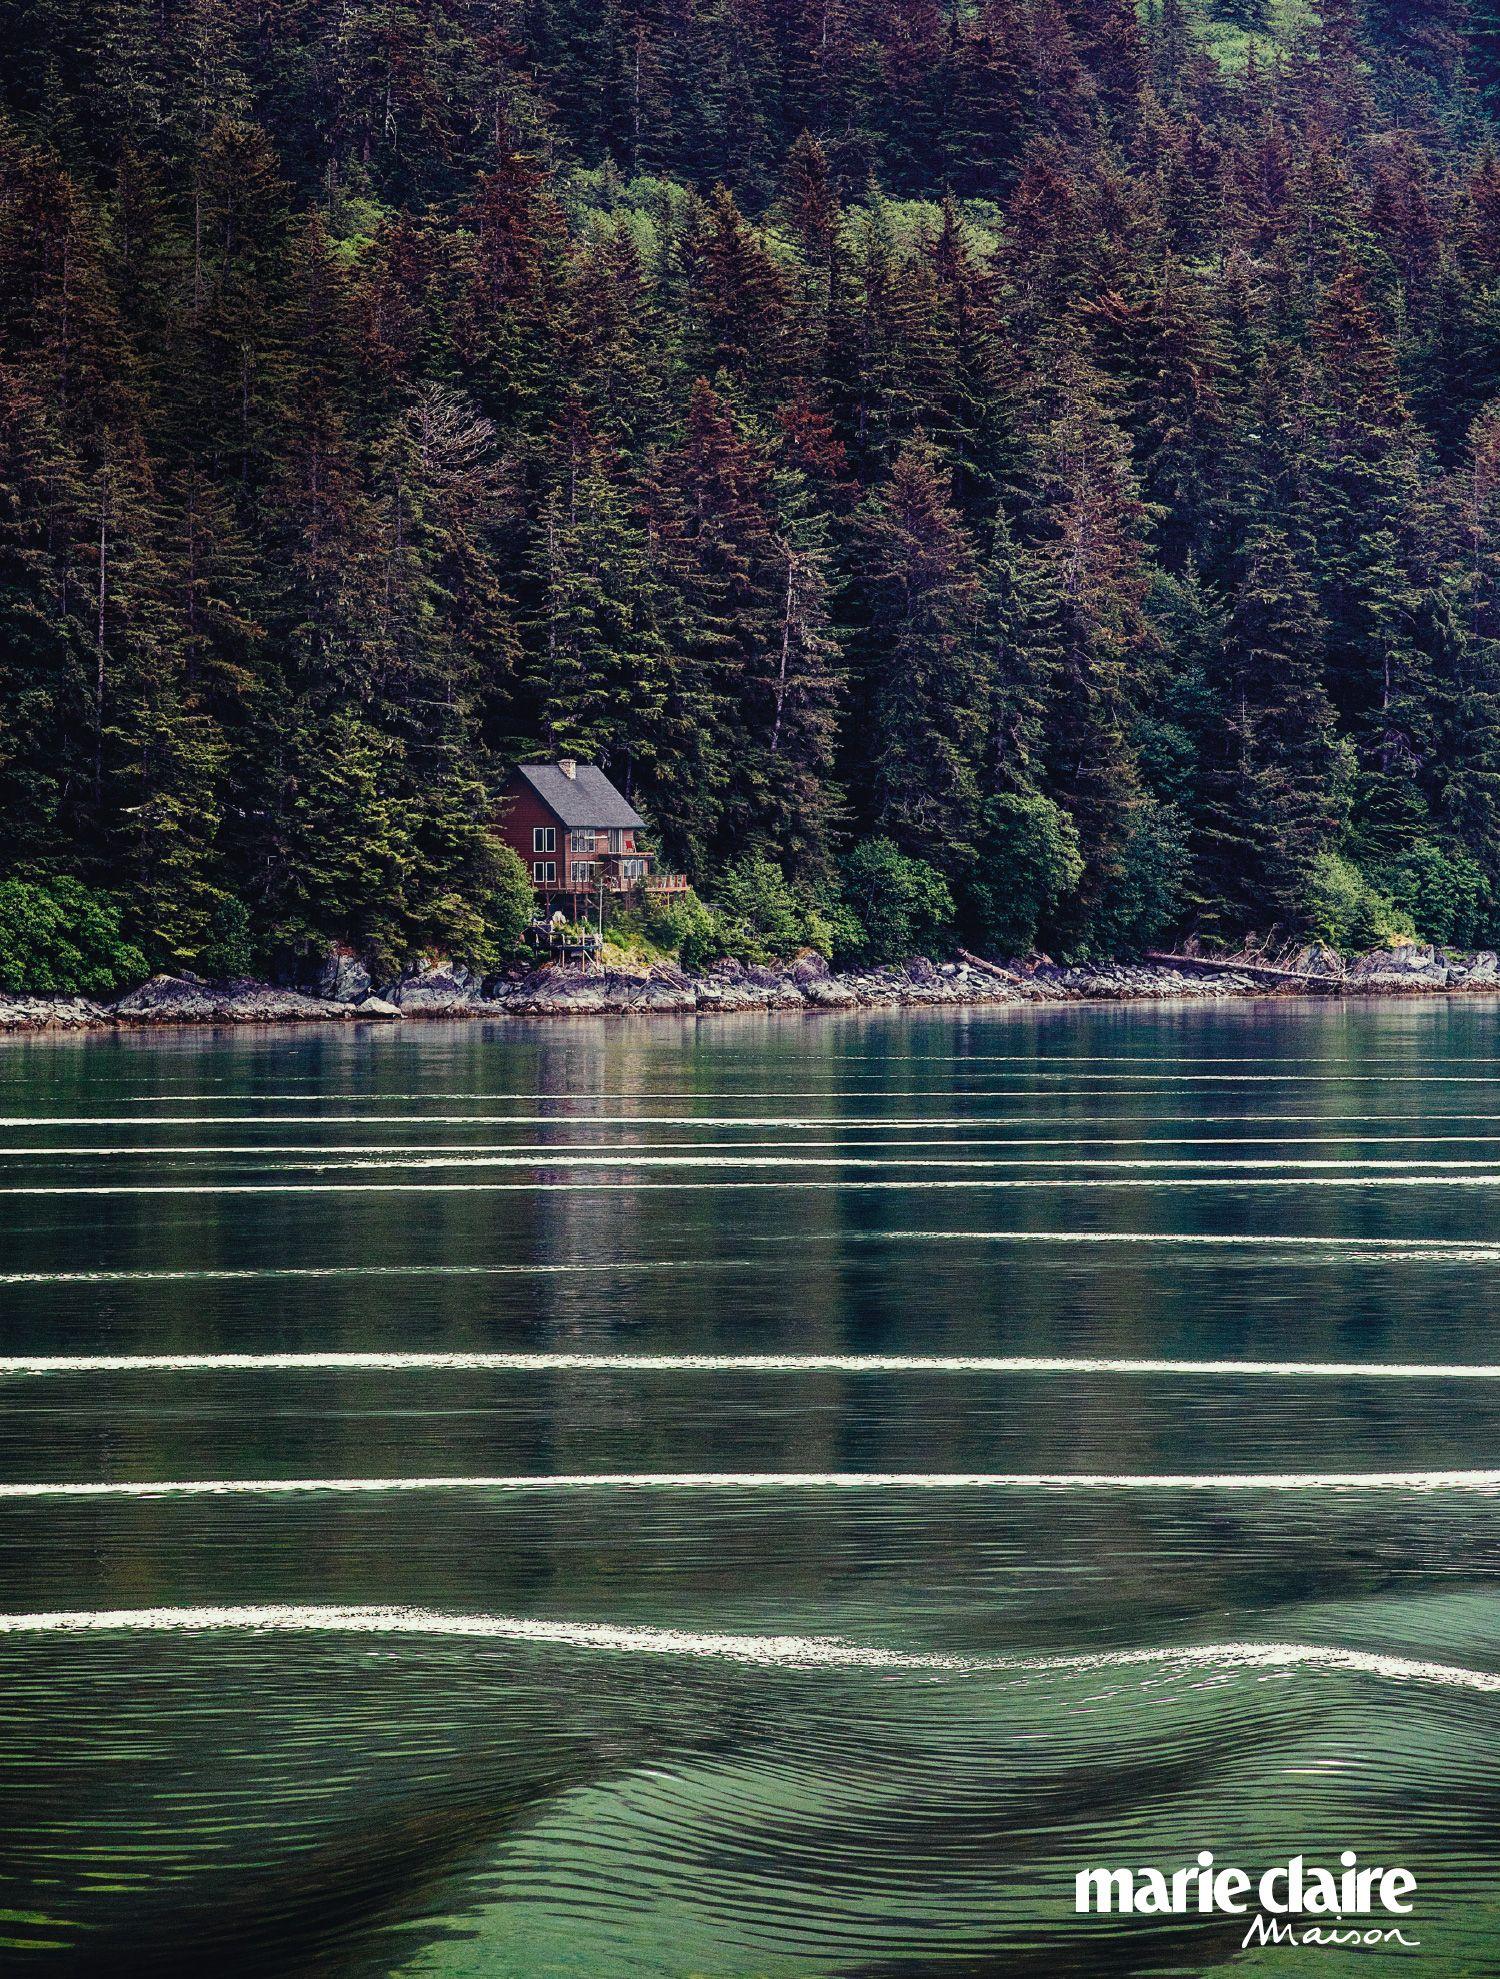 Siti di incontri per Alaskans